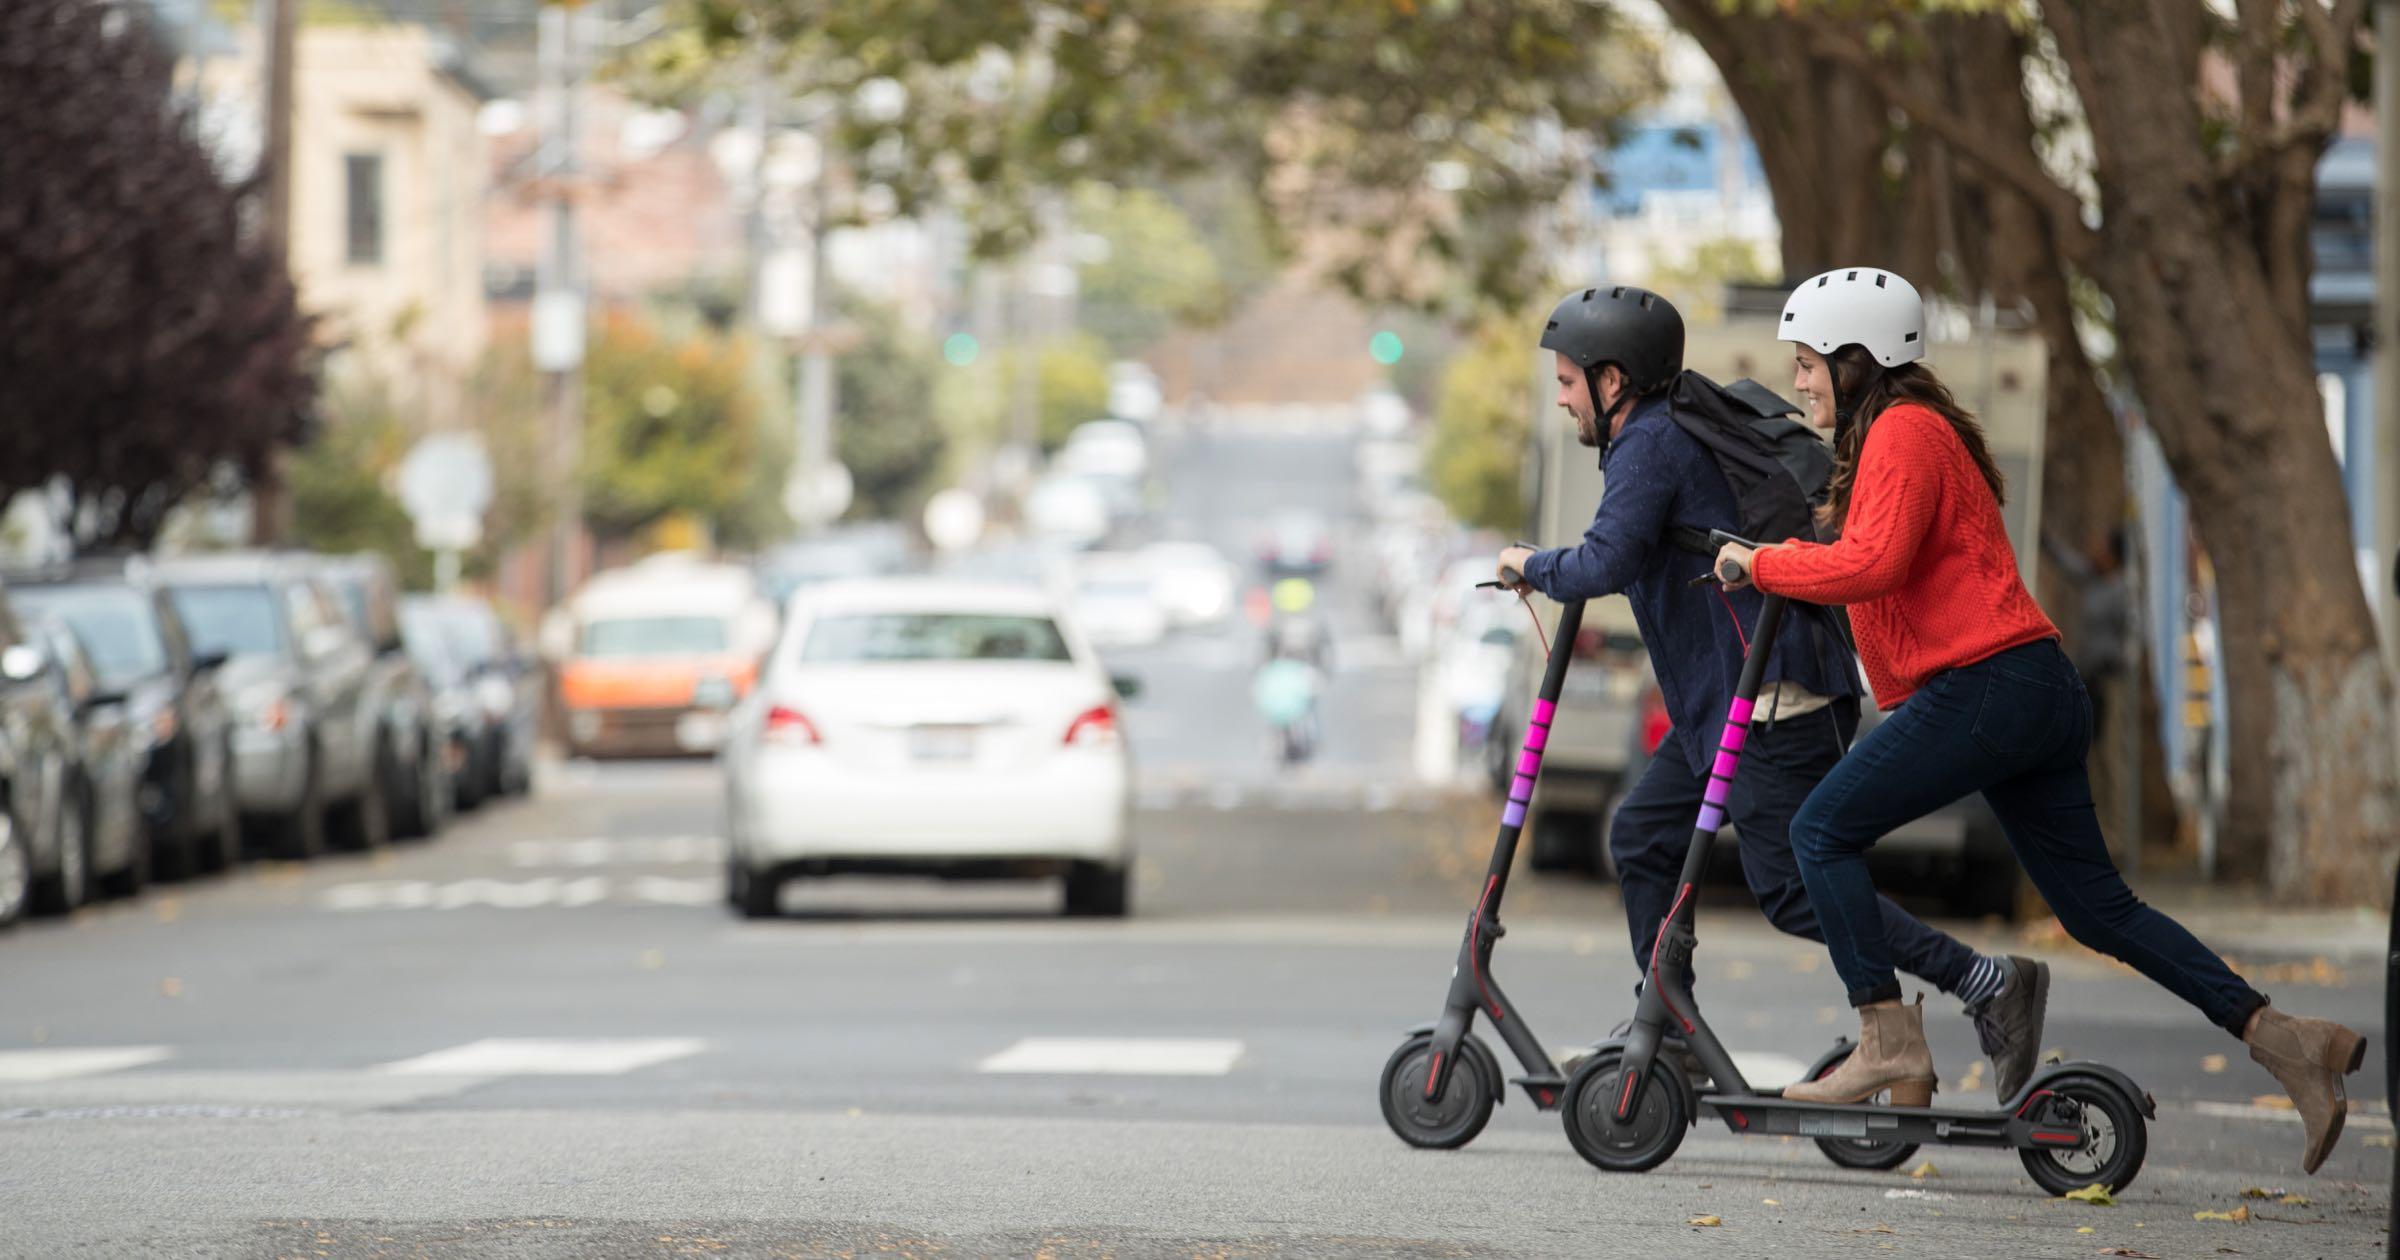 e-scooter companies